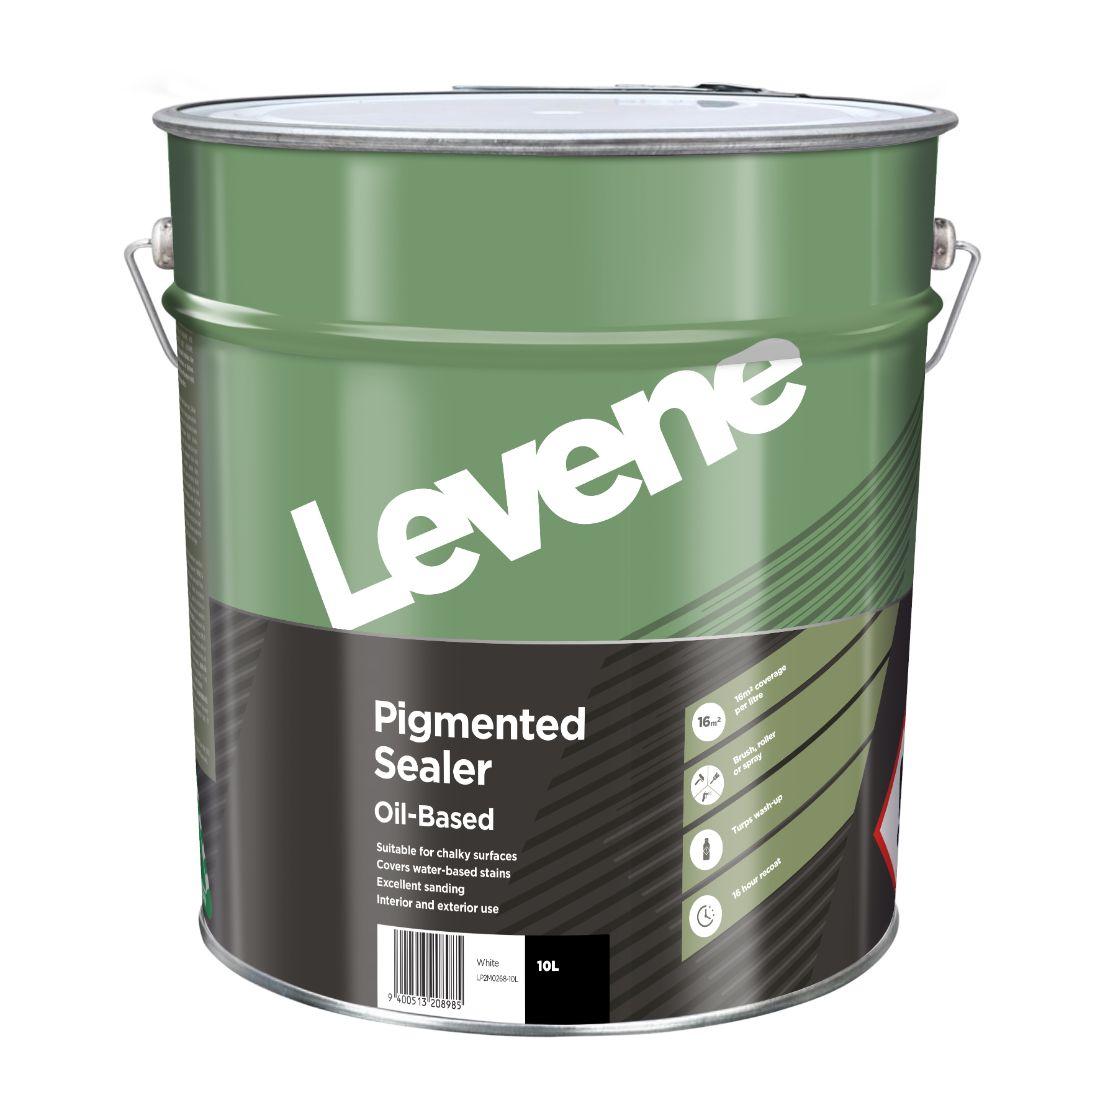 Pigmented Sealer 10L